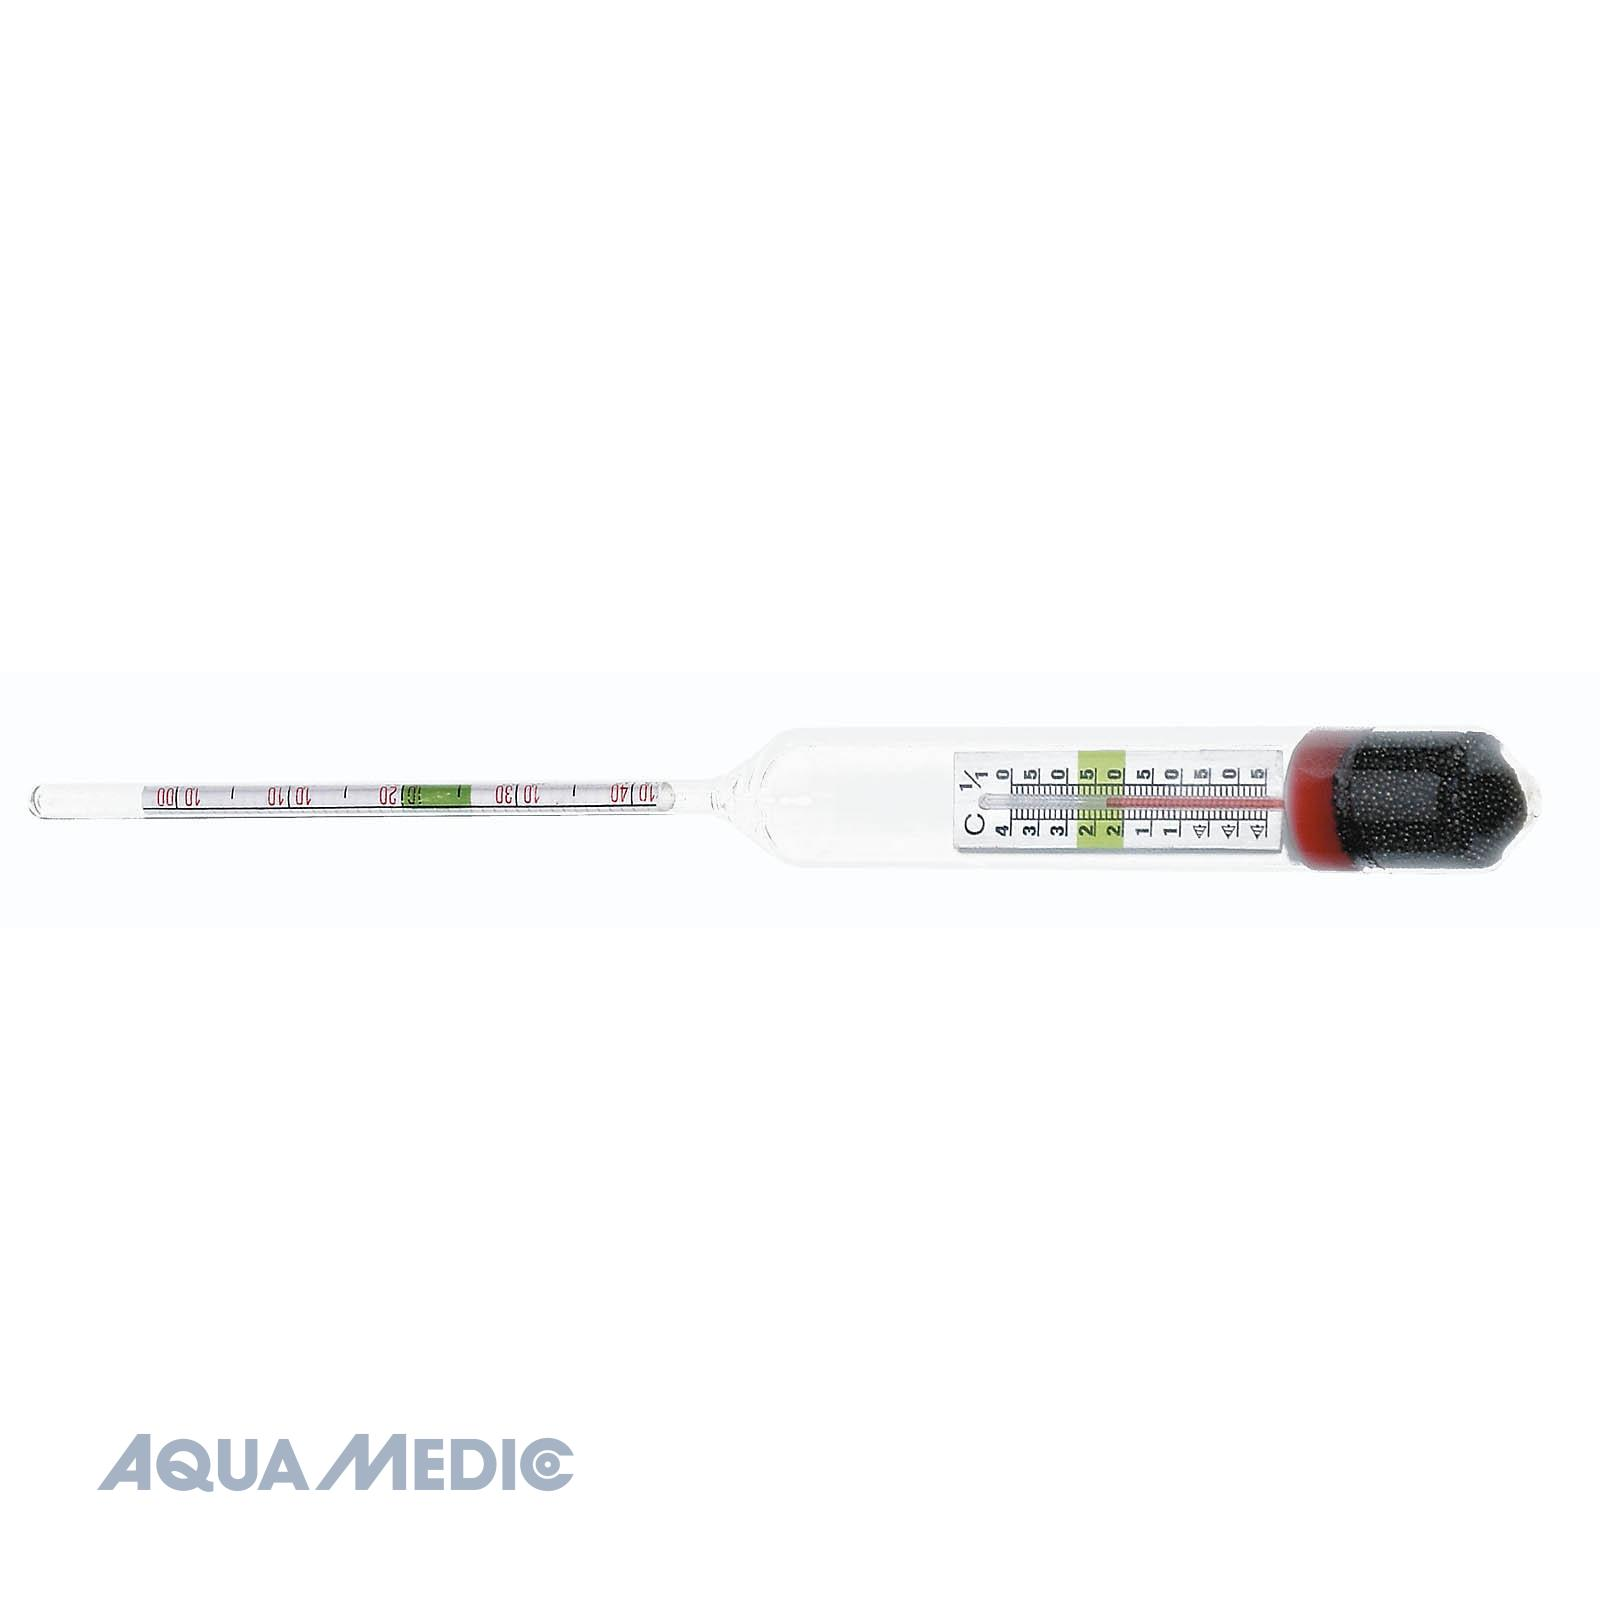 Aquamedic Salimeter (Hydrometer)